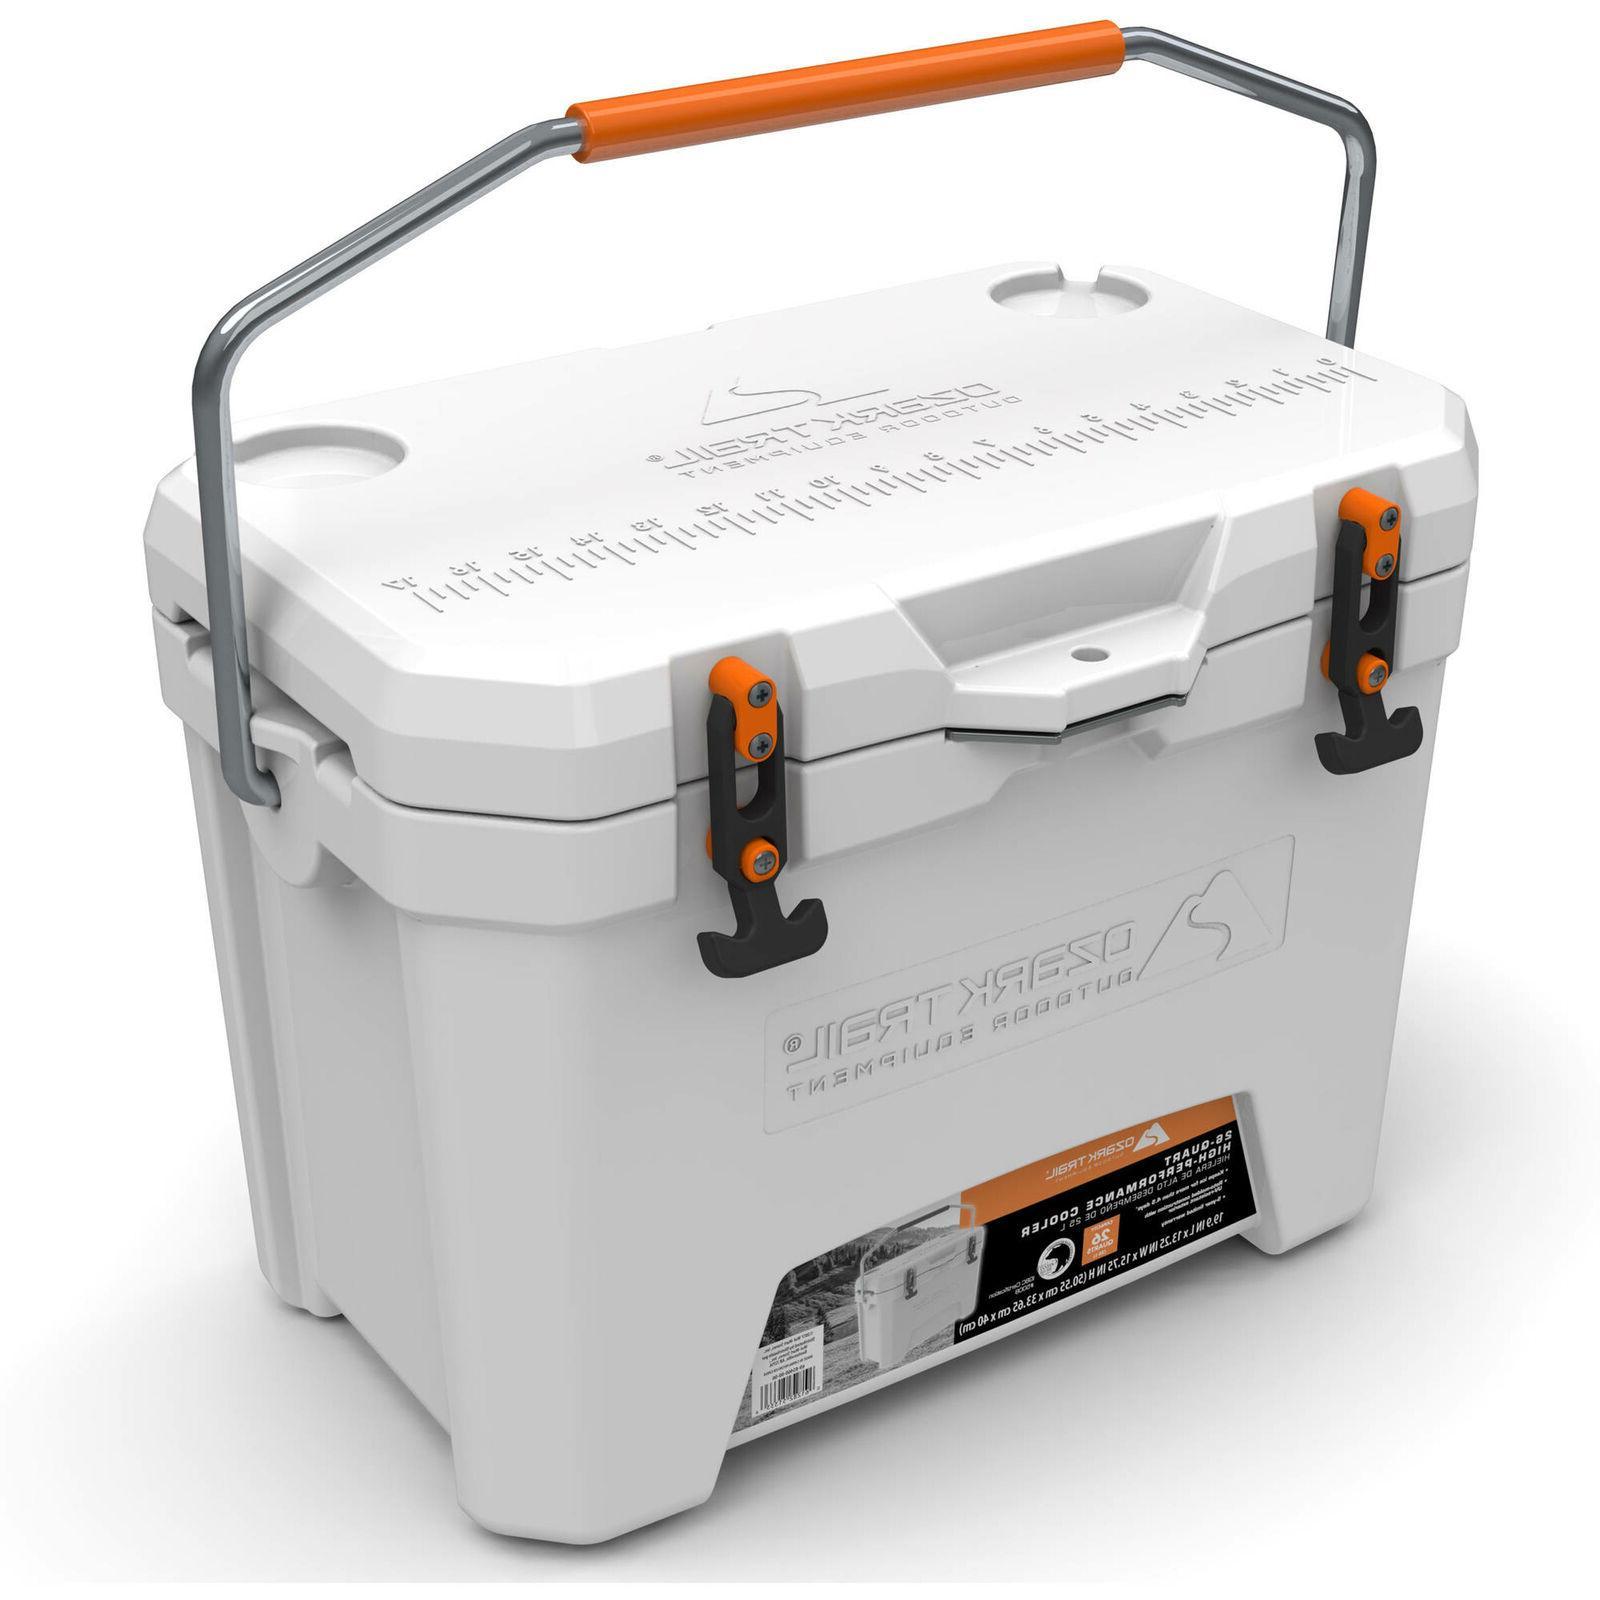 26 quart high performance cooler white free